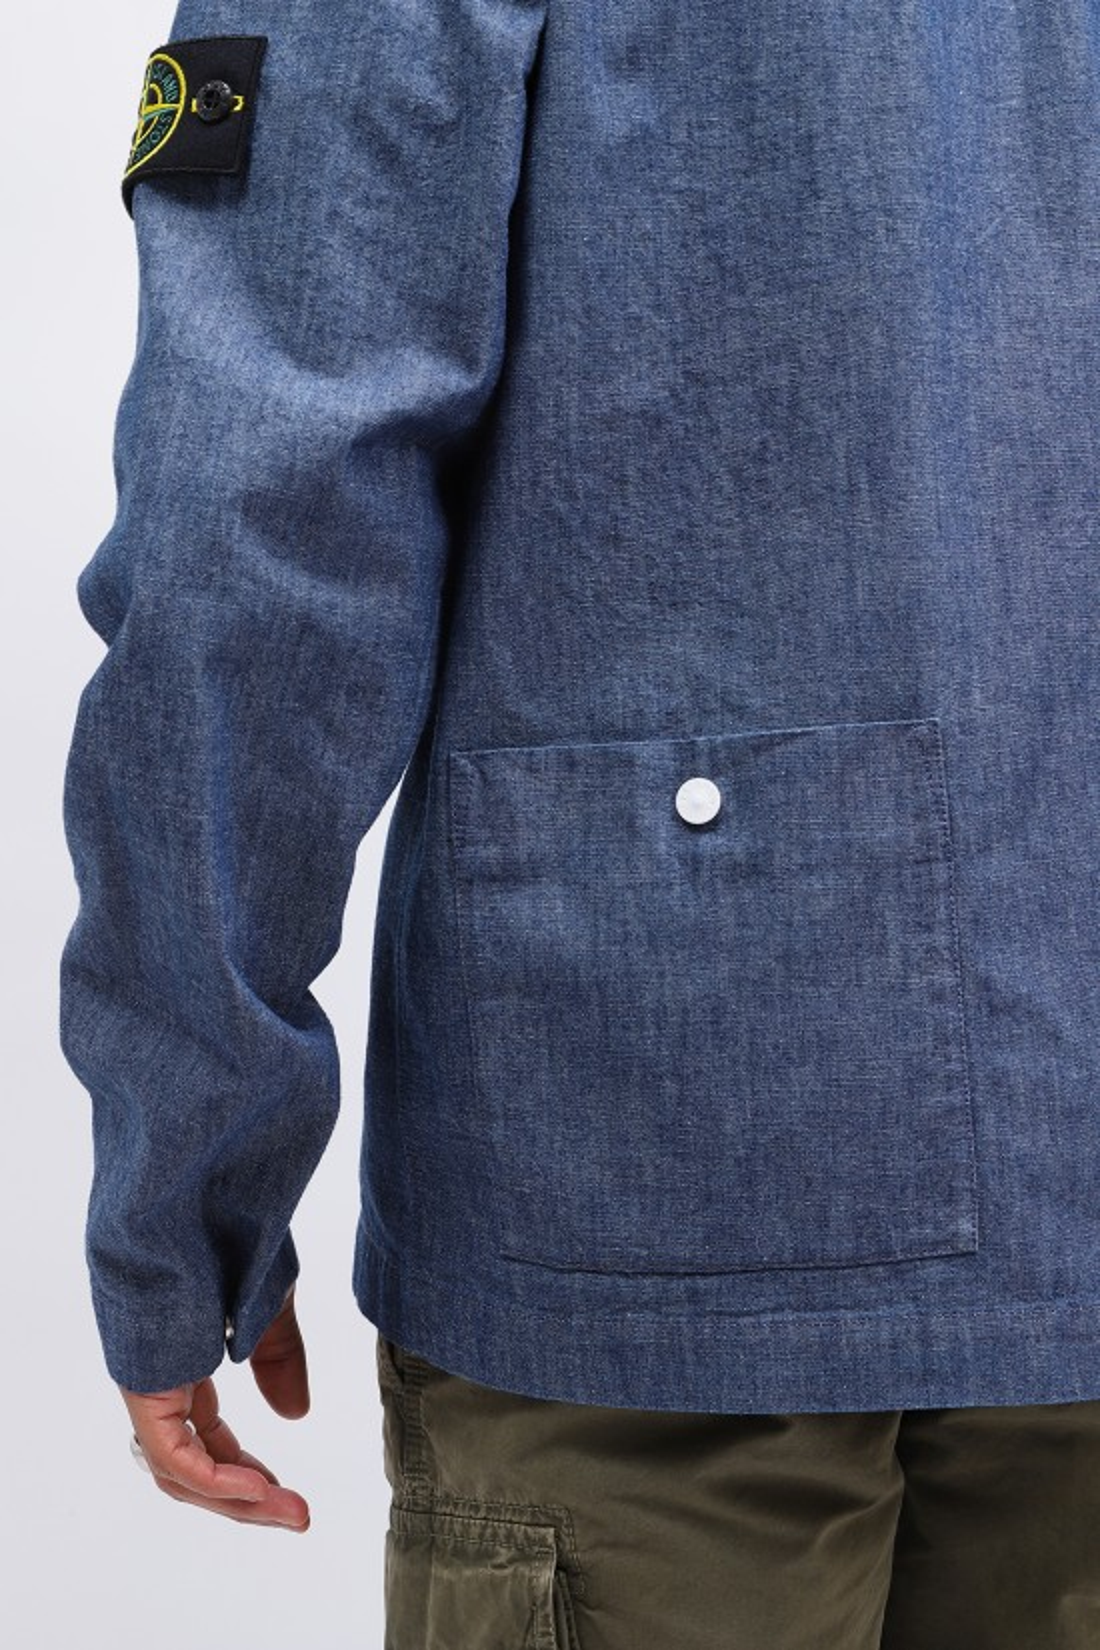 STONE ISLAND / 11207 chambray overshirt Wash